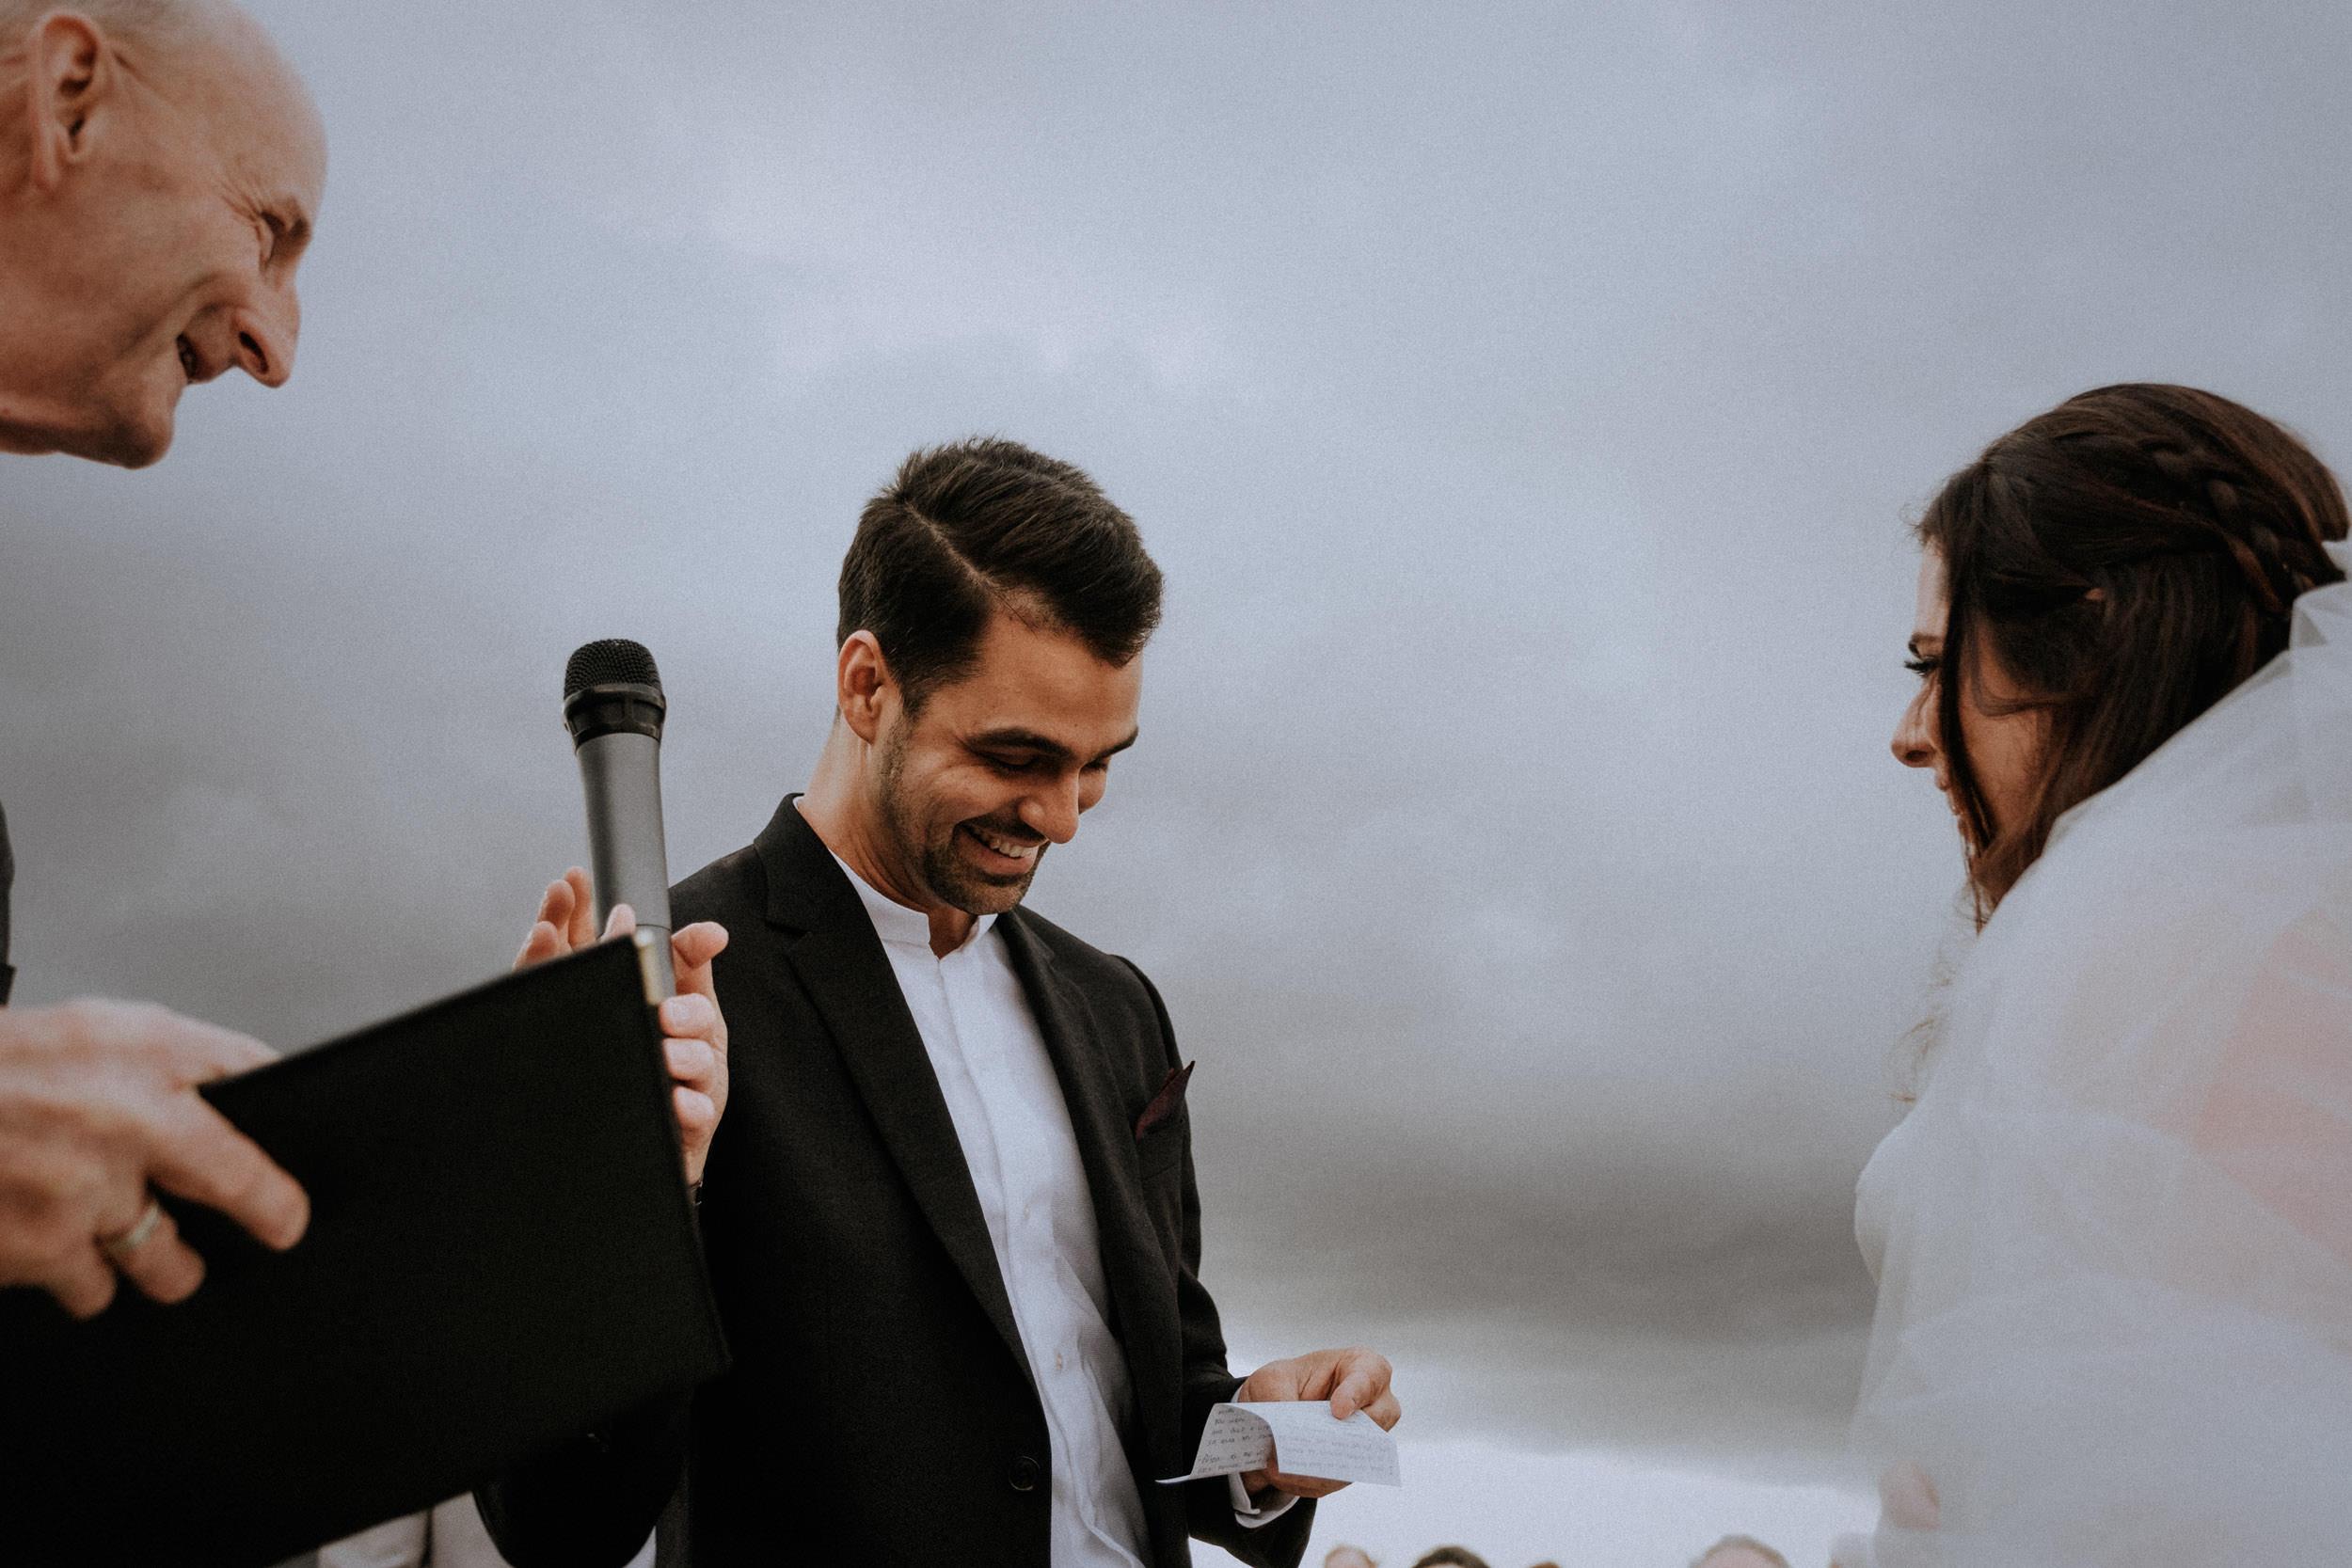 s+j_top_elopement wedding photography_kings & thieves_blog - 276.jpg